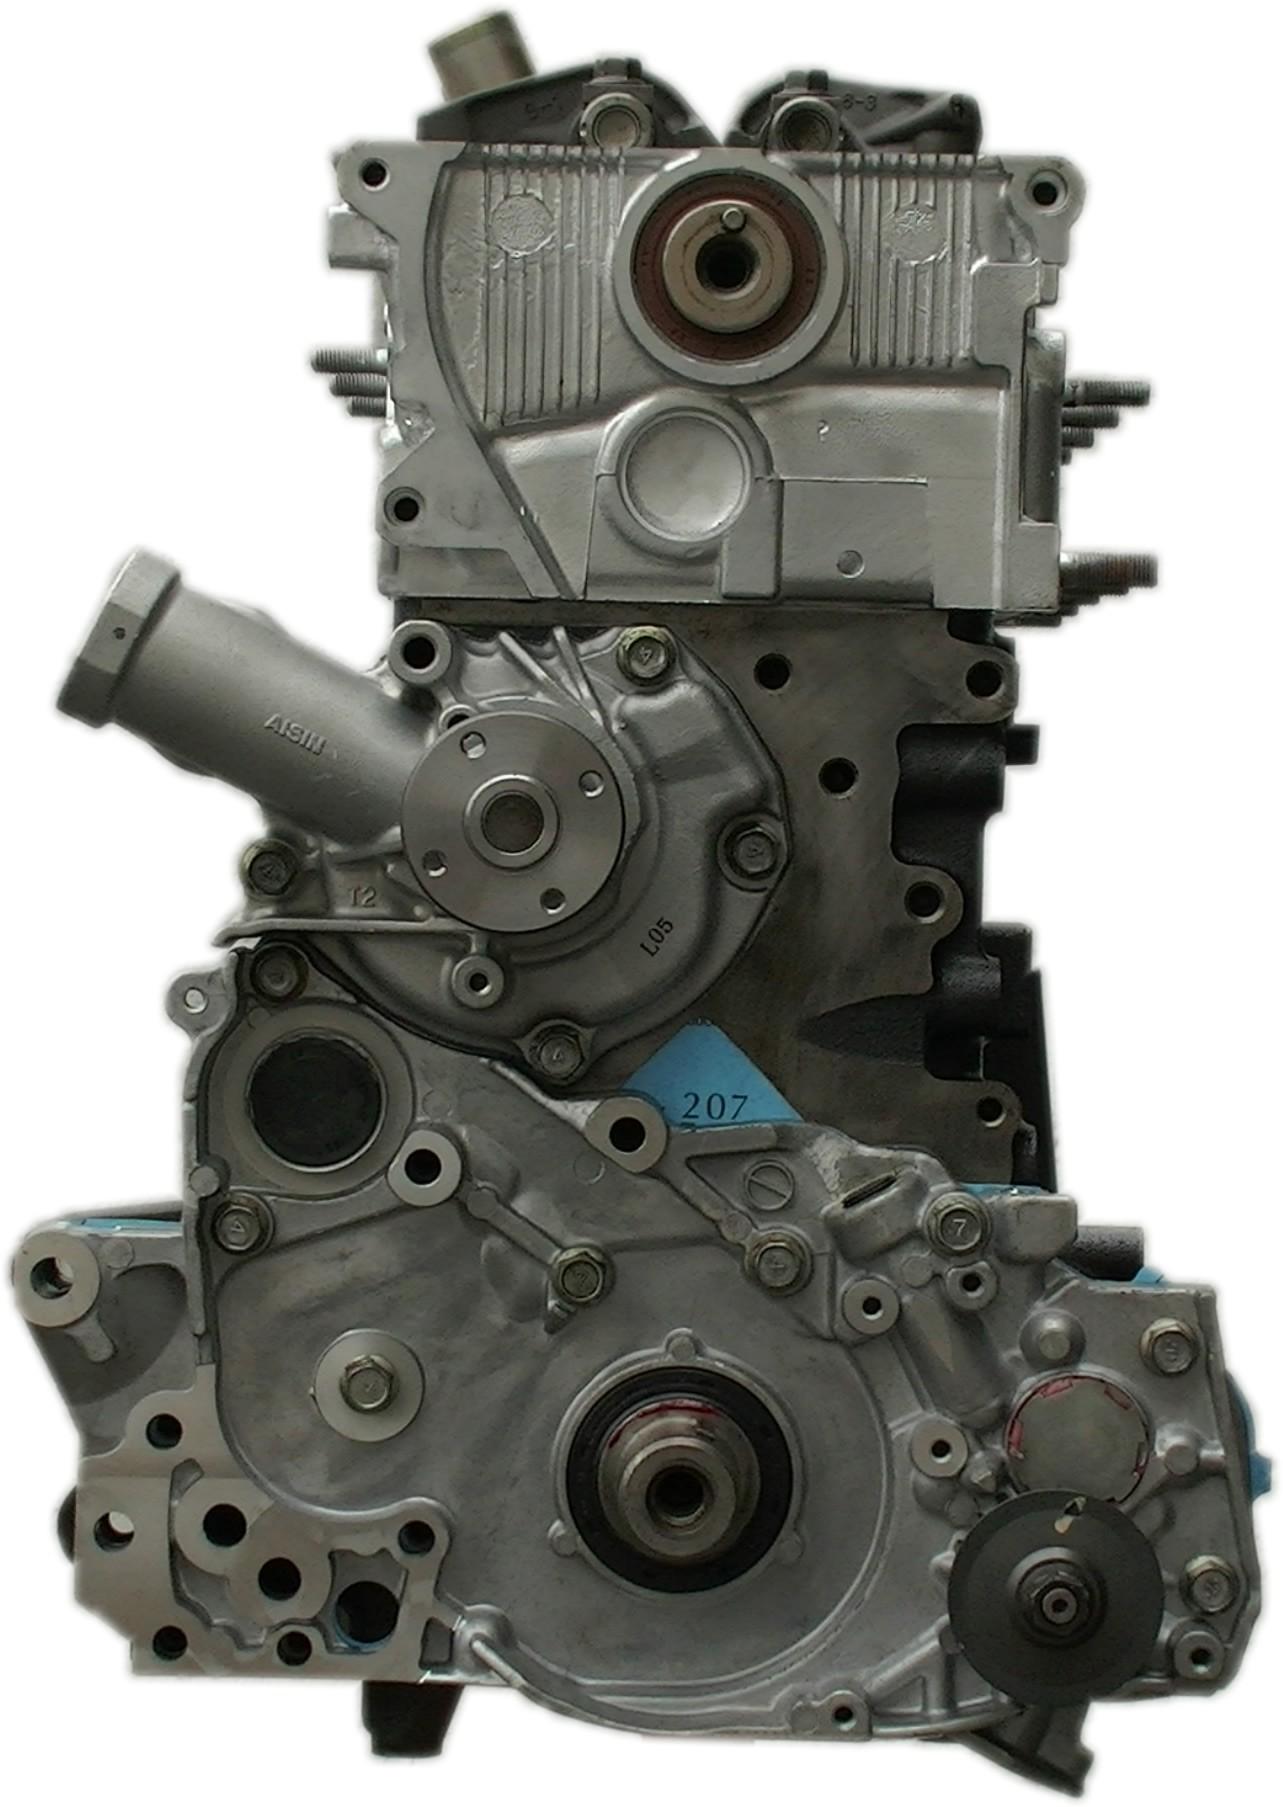 Rebuilt 94-98 Mitsubishi Galant 2.4L 4cyl 4G64 Engine « Kar King Auto